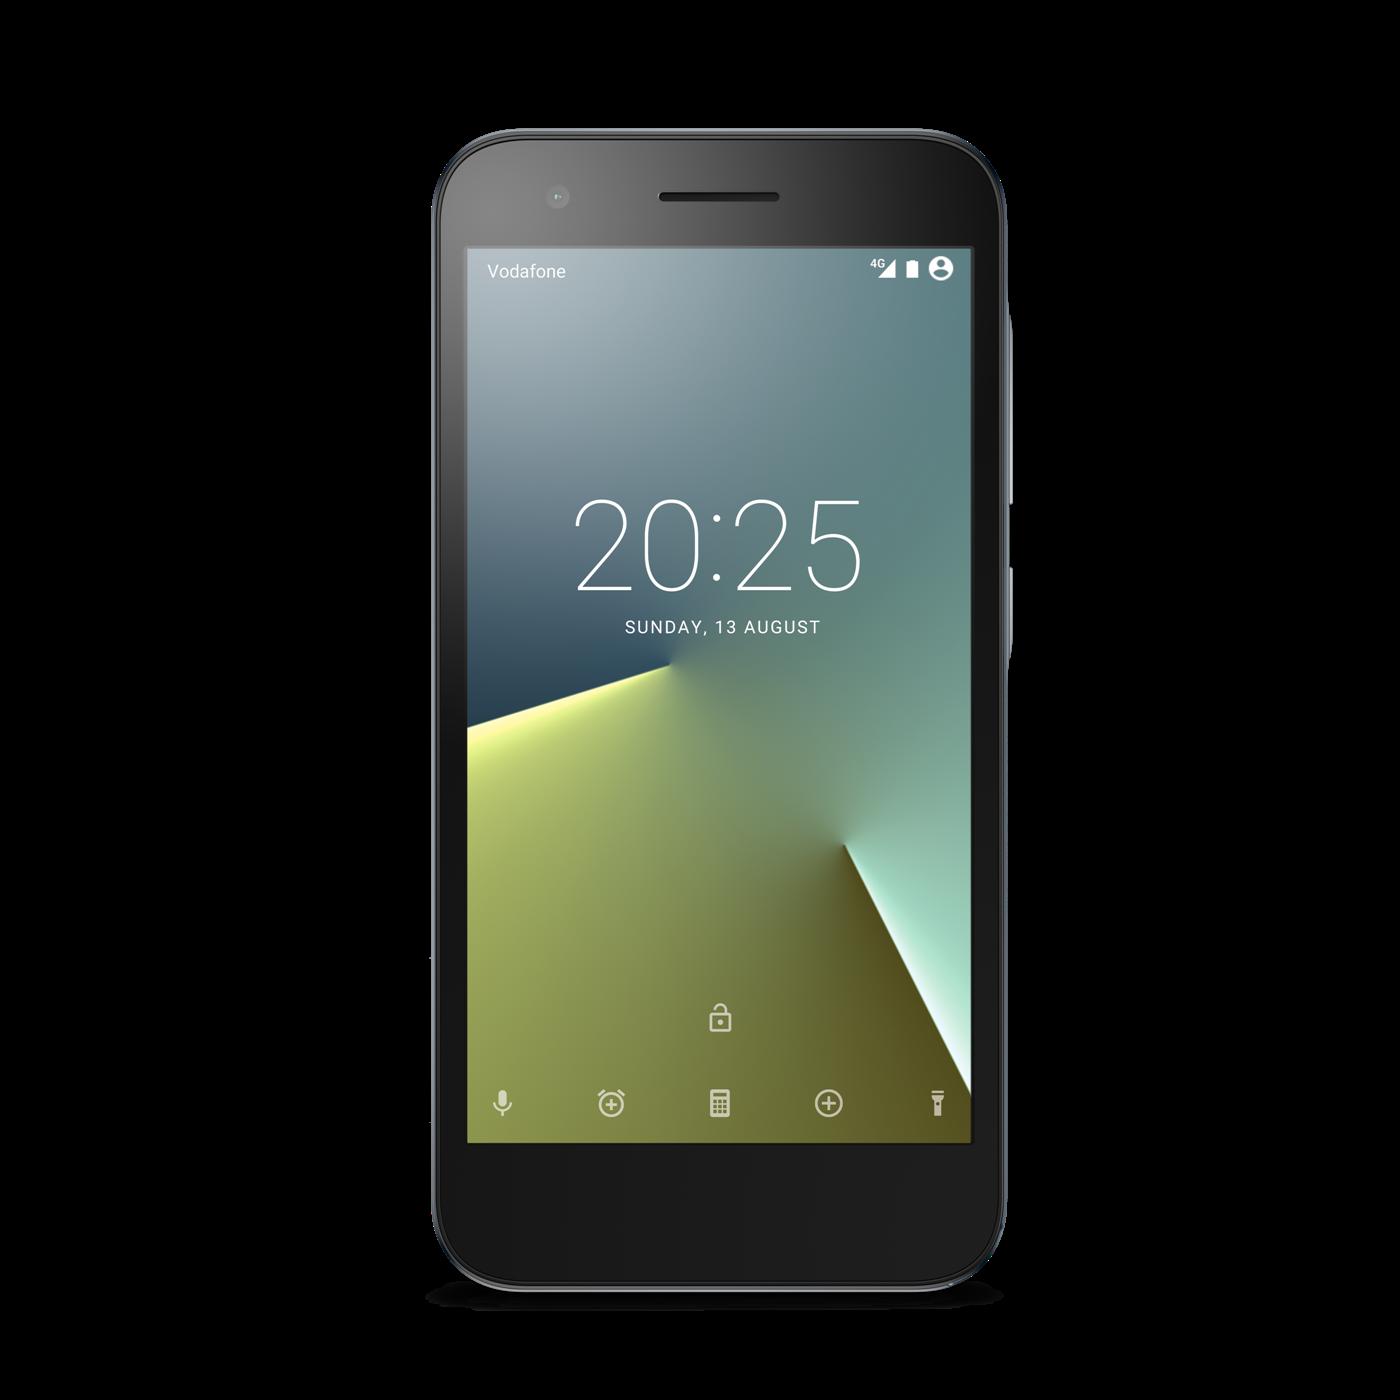 Vodafone Tarif Smart S